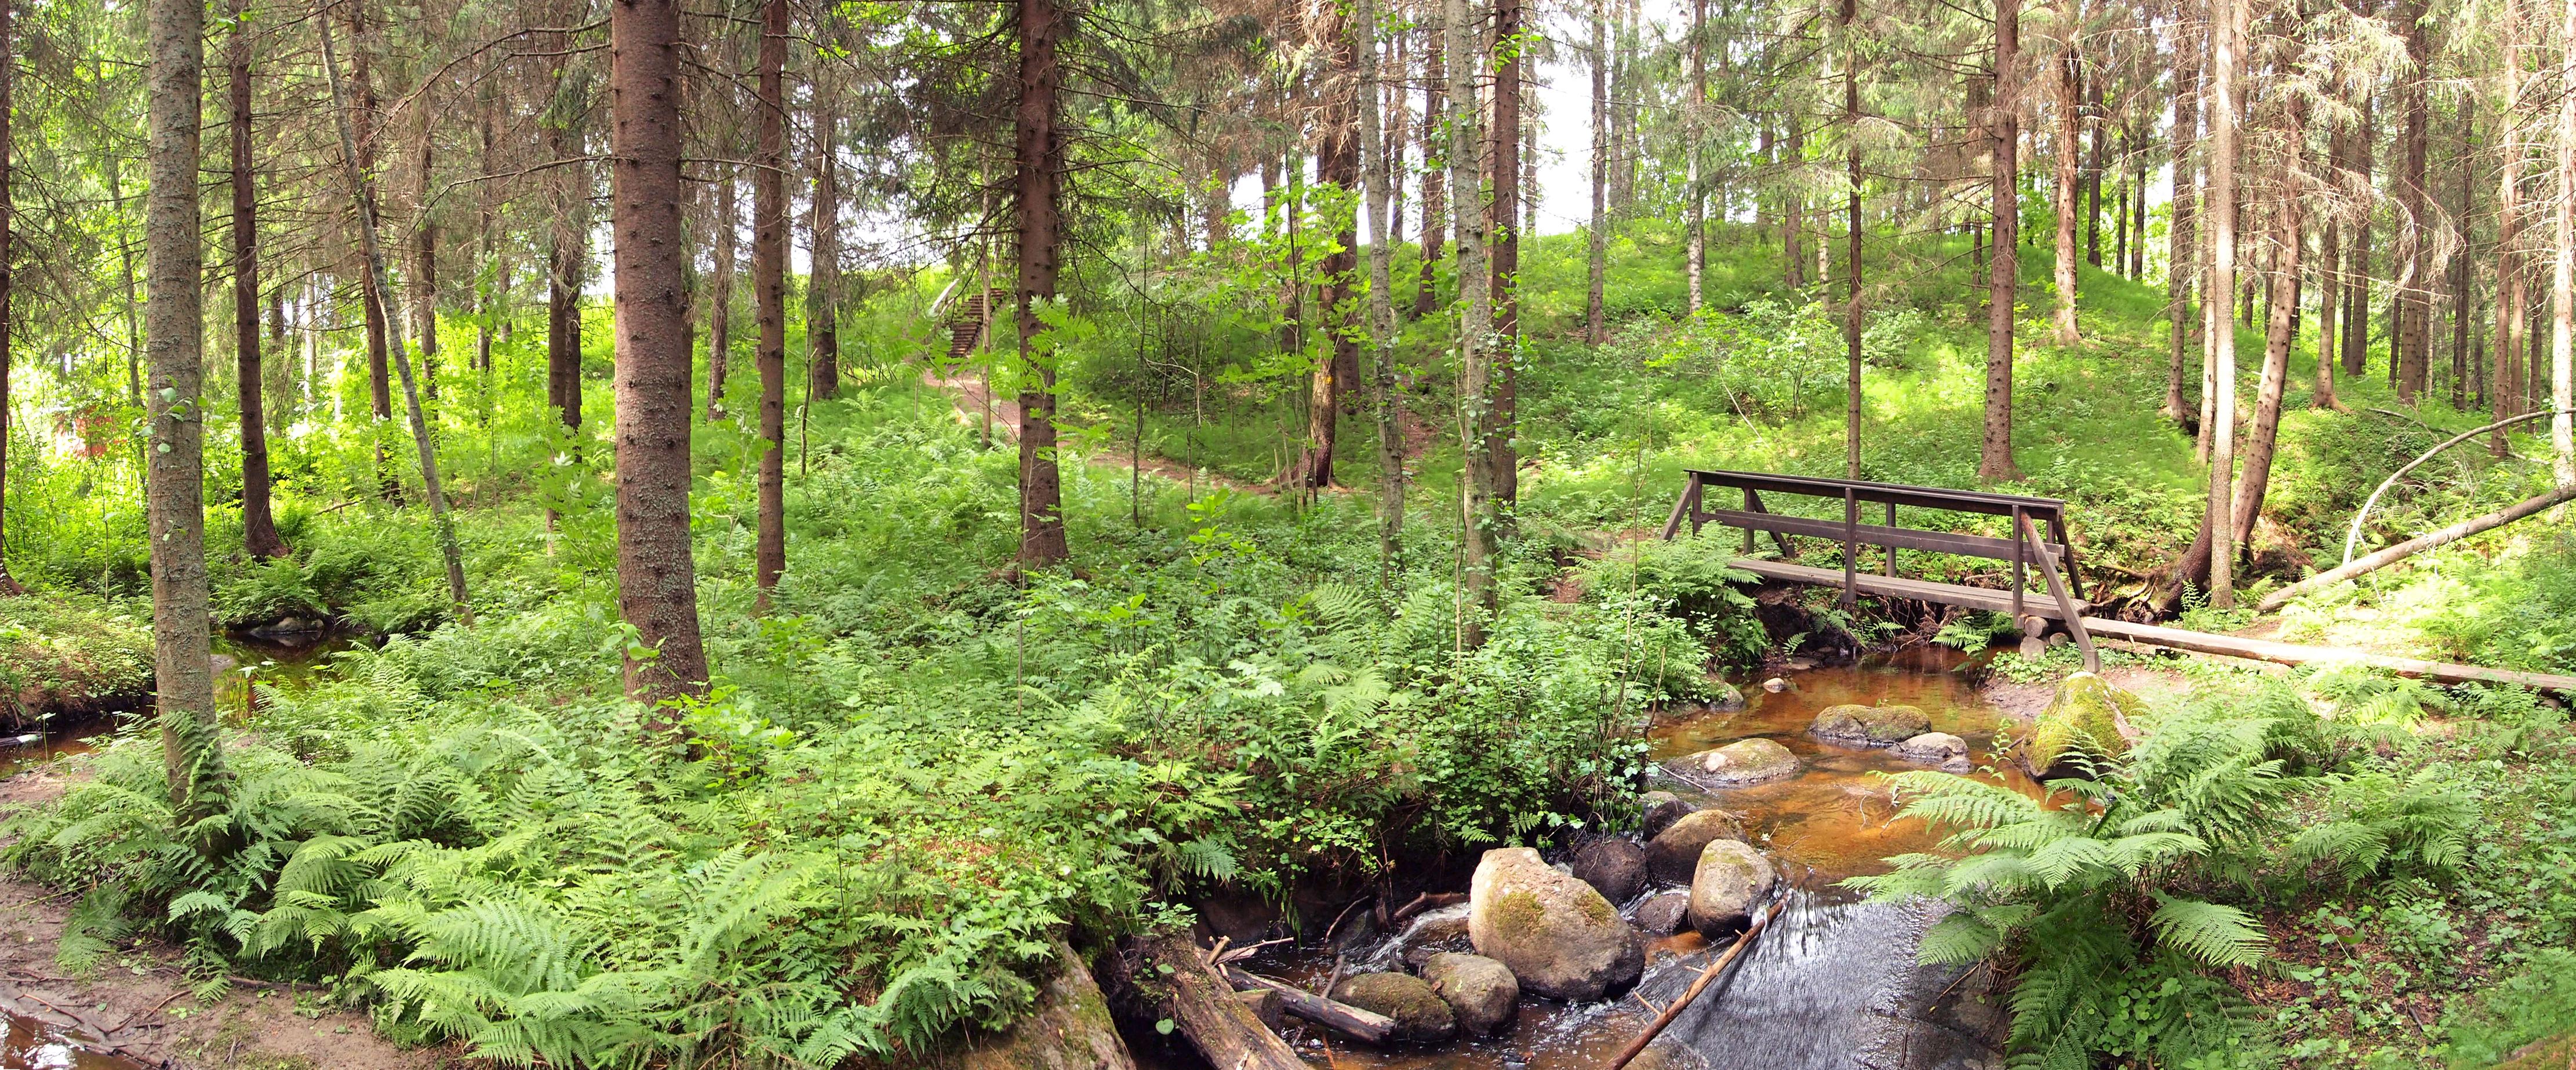 File:Koskikara nature ...